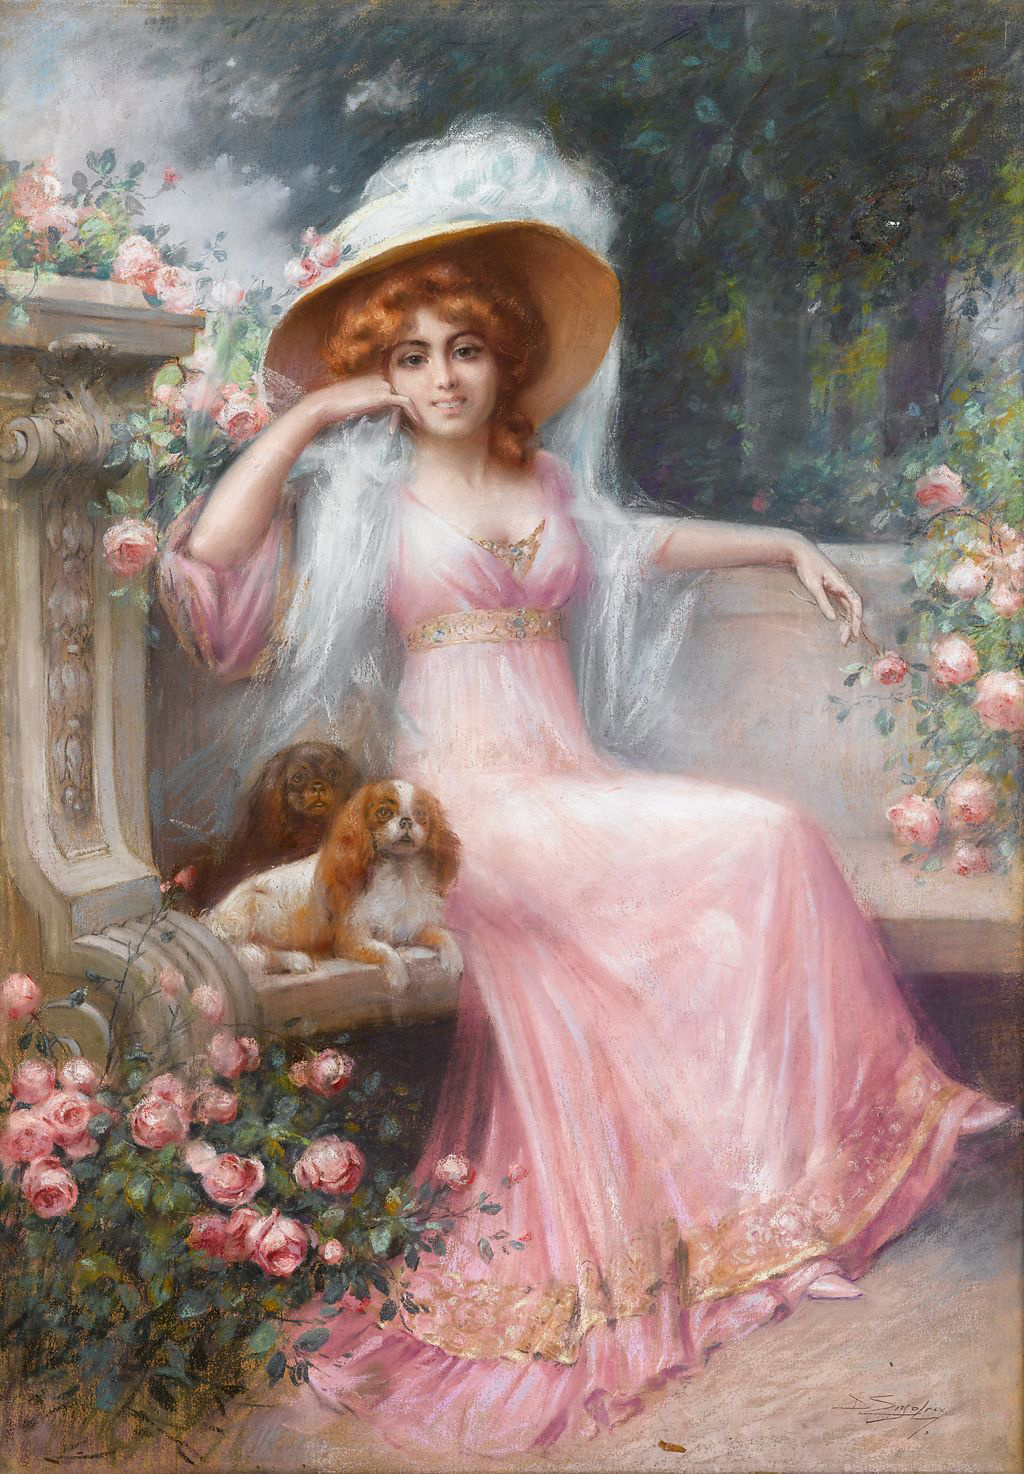 Dolphin Angolra. An elegant lady with her boyfriend, King Charles Spaniel.